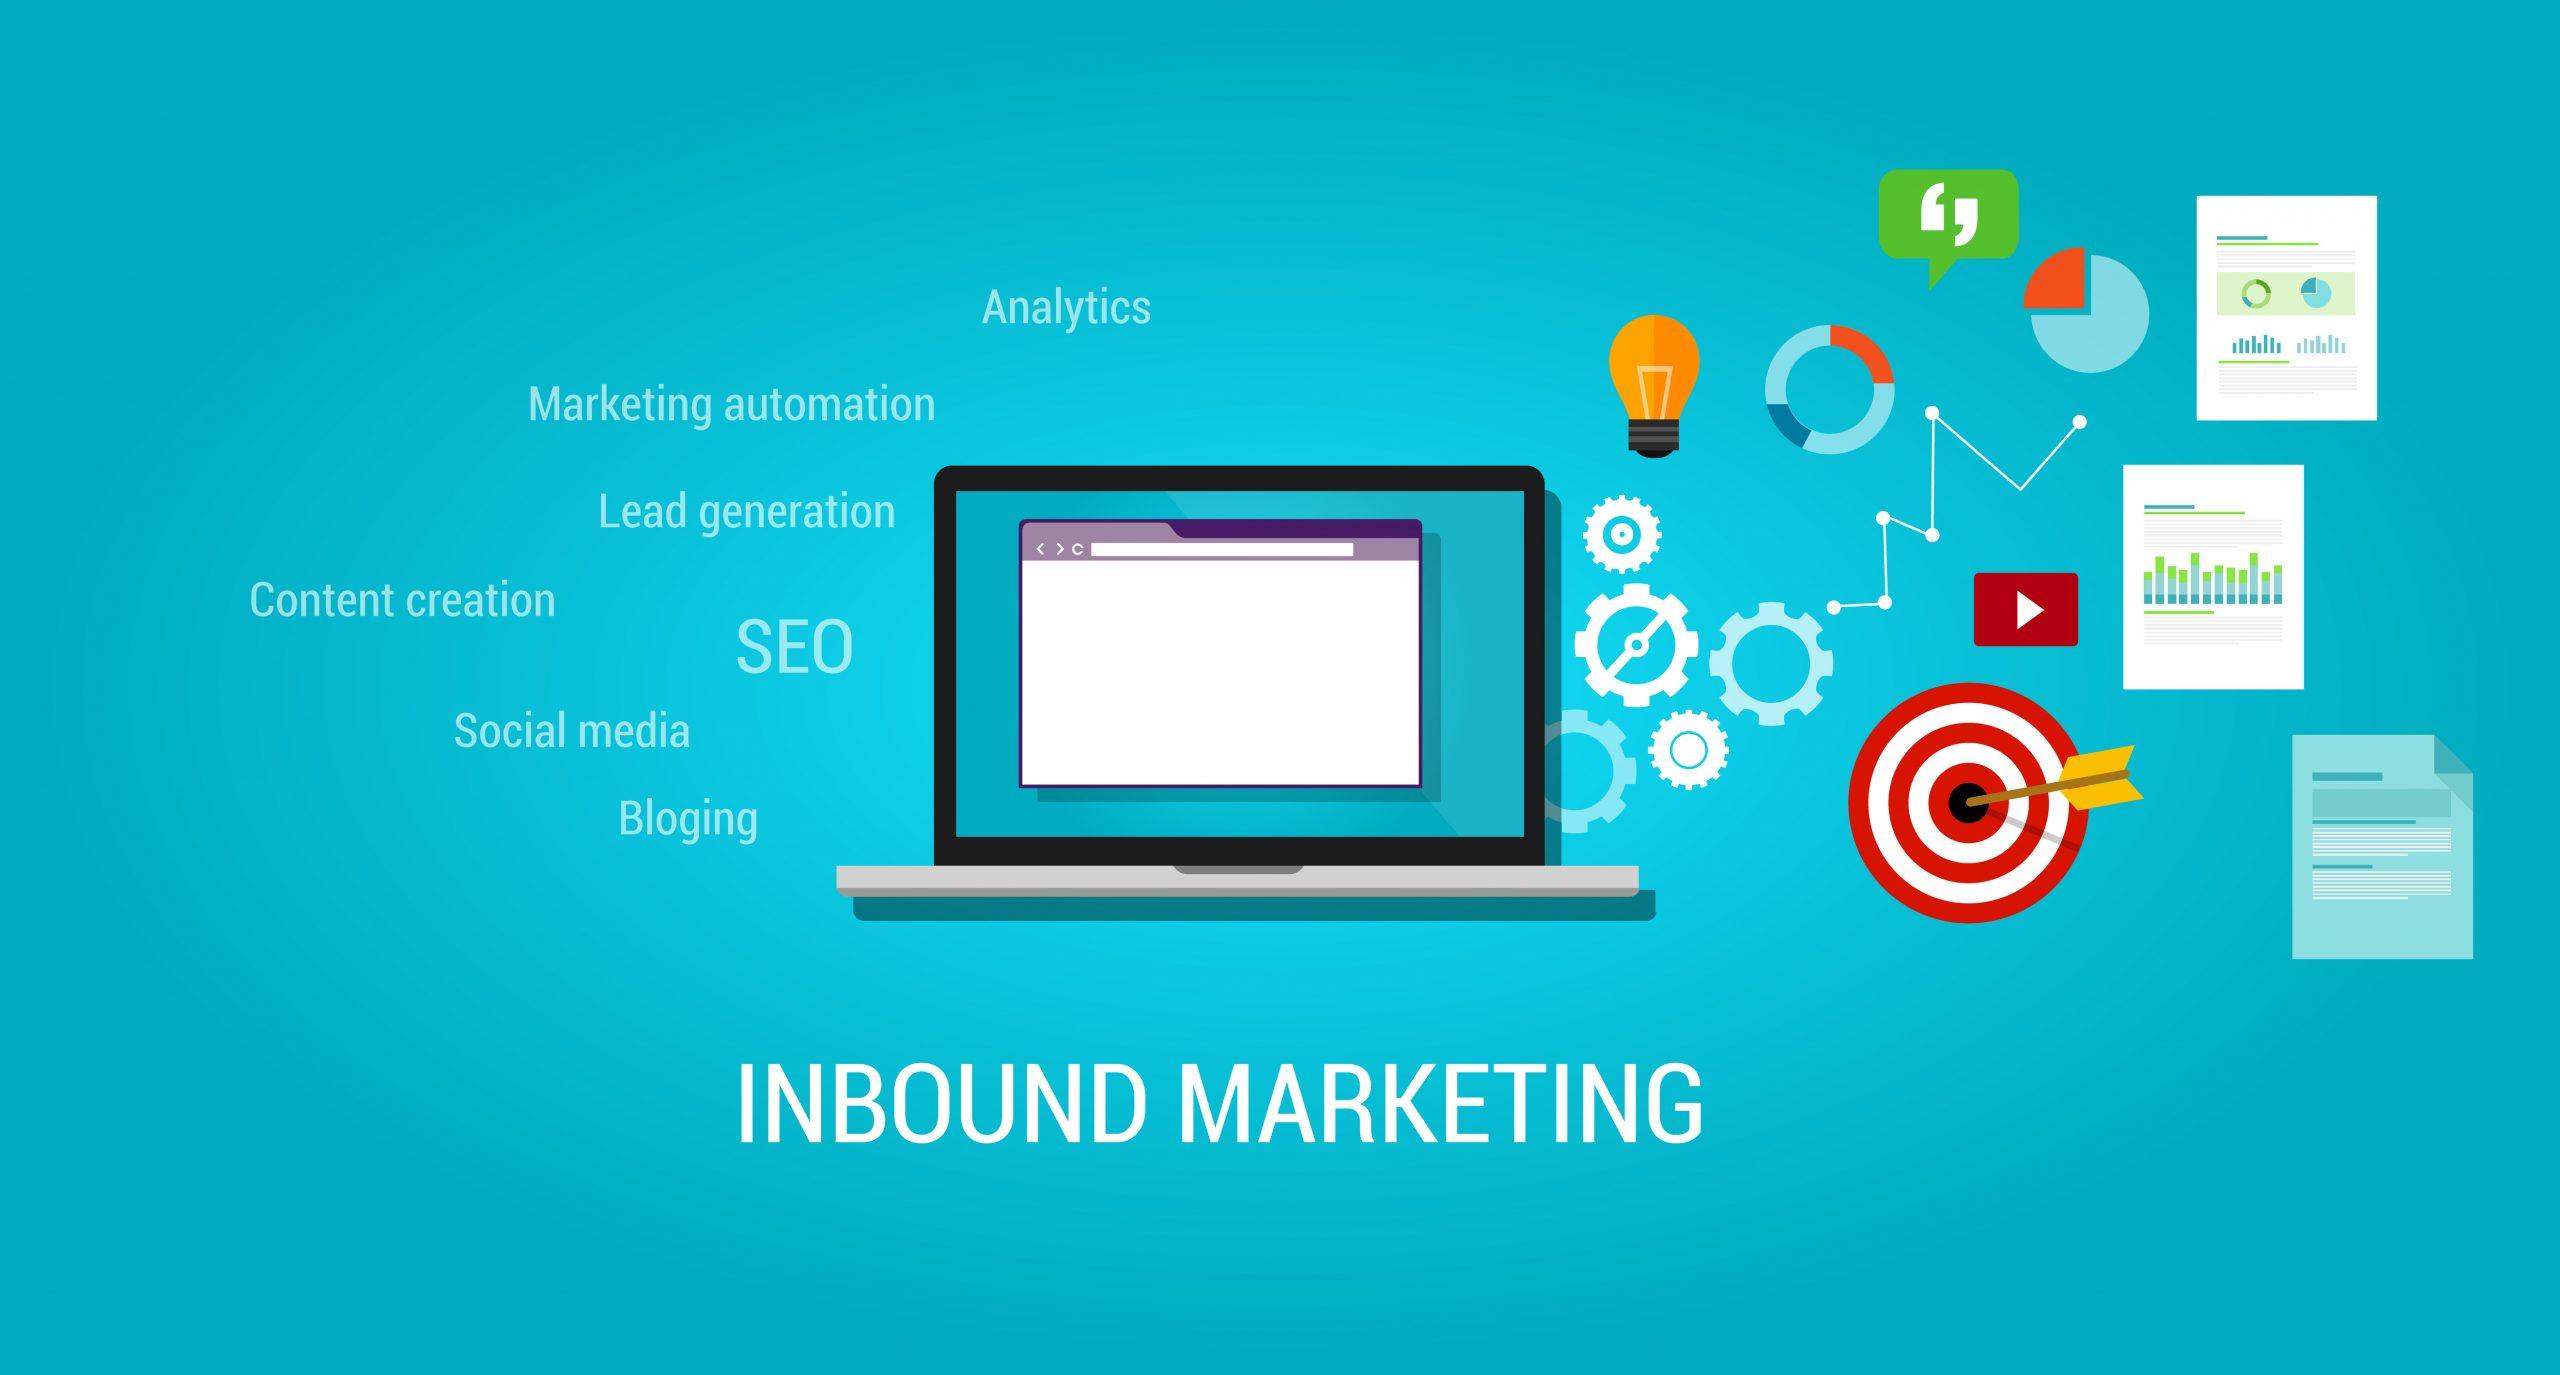 inbound content blog marketing SEO digital traffic